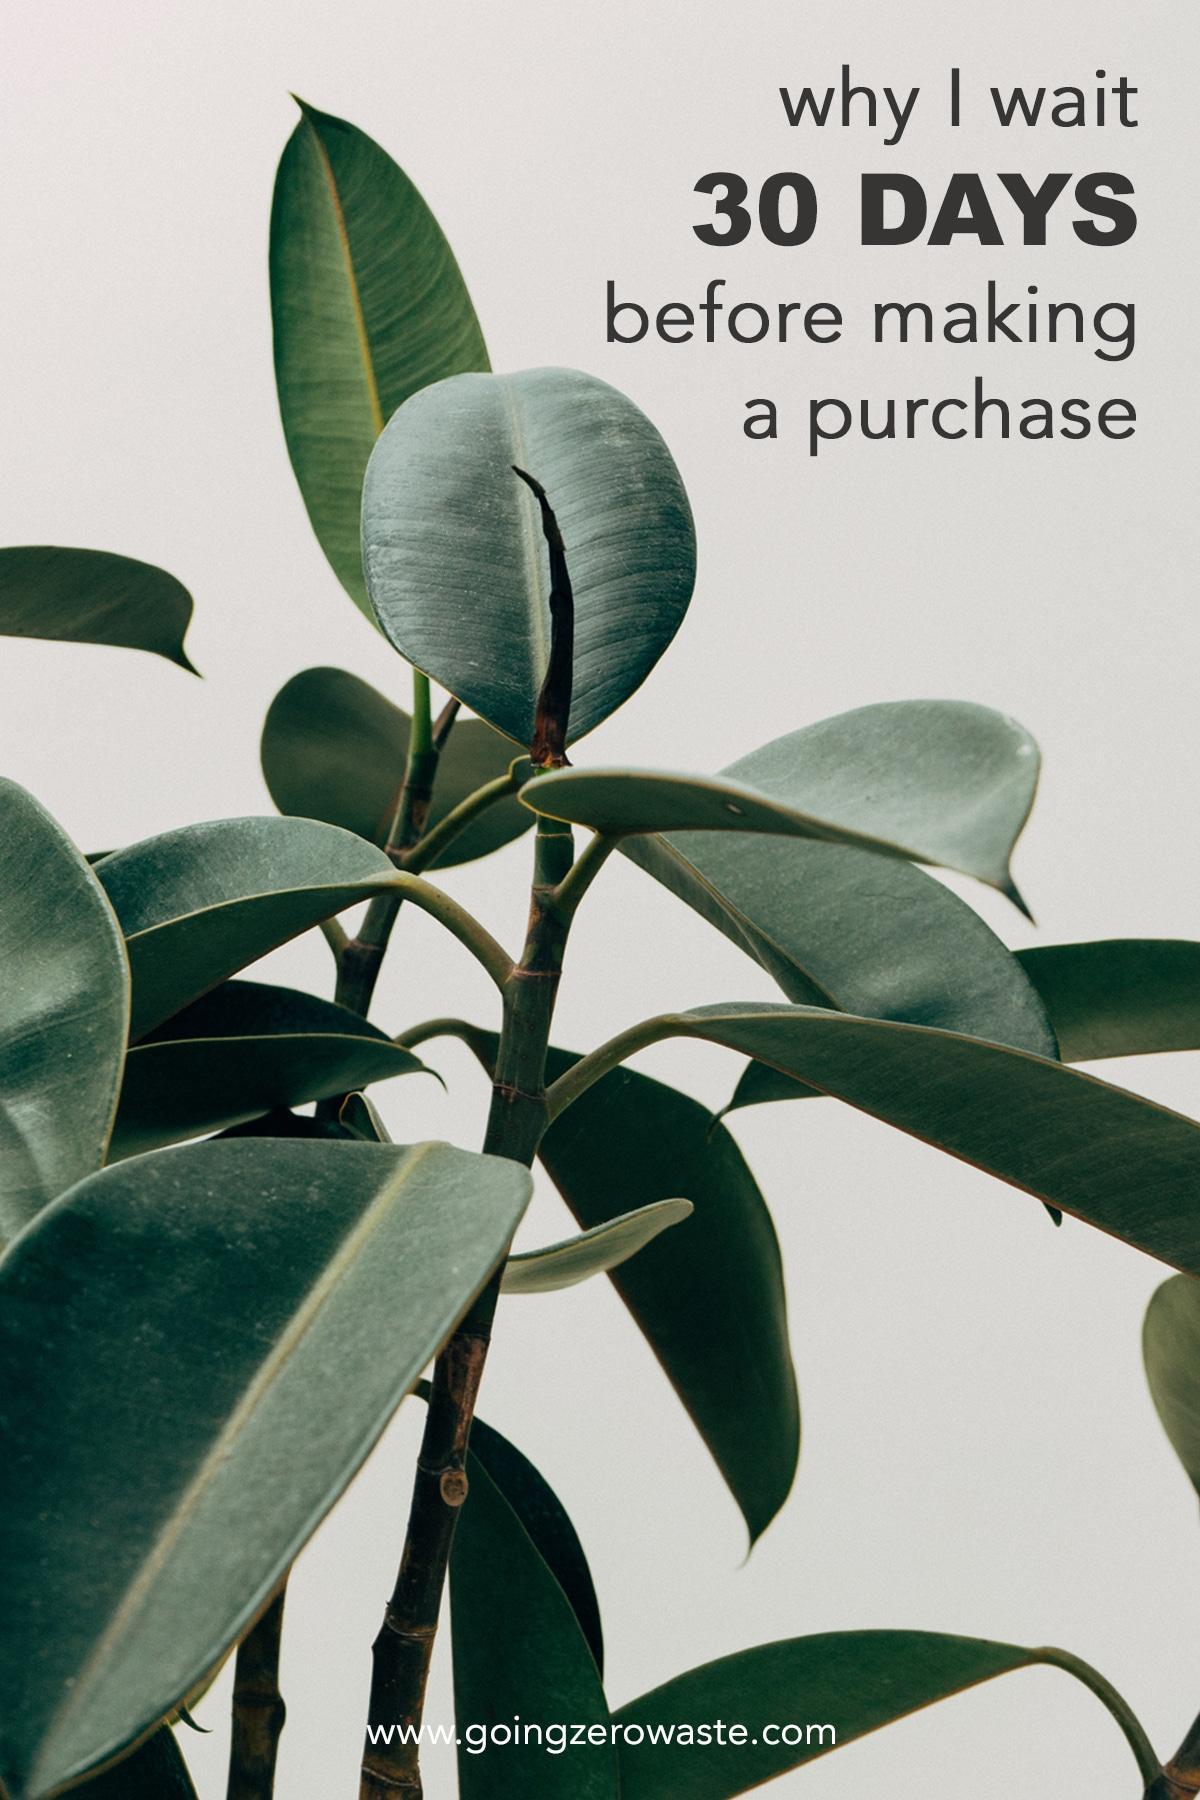 Why I Wait 30 Days Before I Make a Purchase